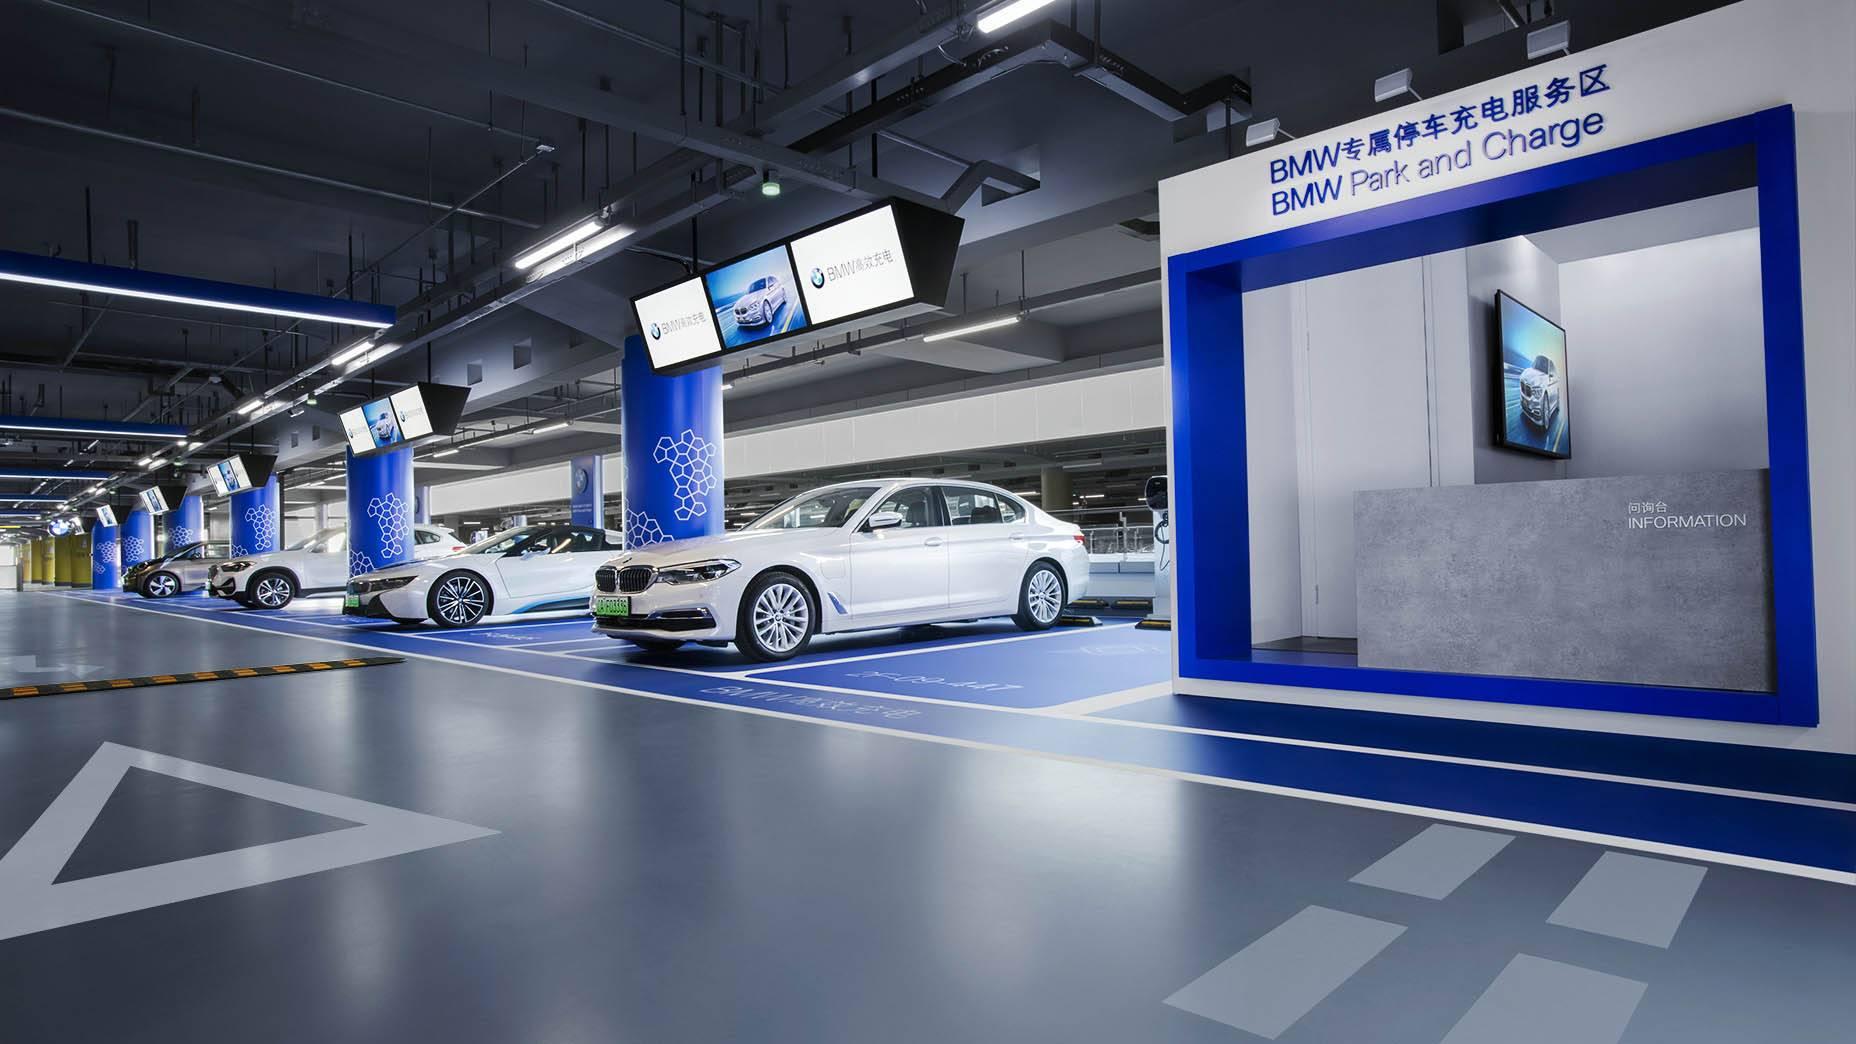 07.BMW 专属预约停车充电服务.jpg